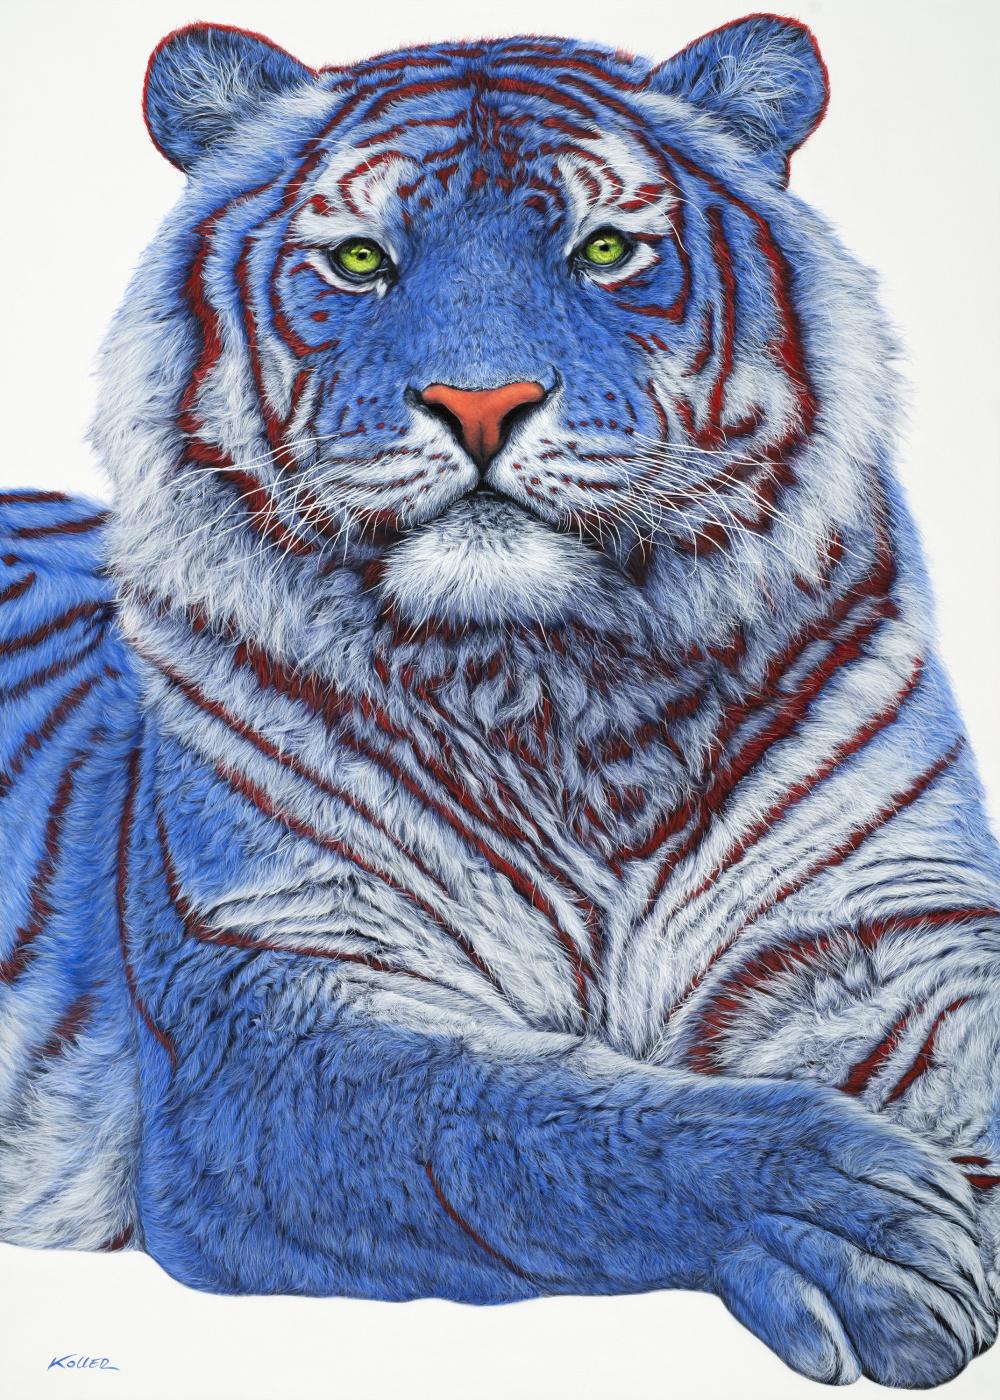 Helmut Koller. SIBERIAN TIGER IN BLUE